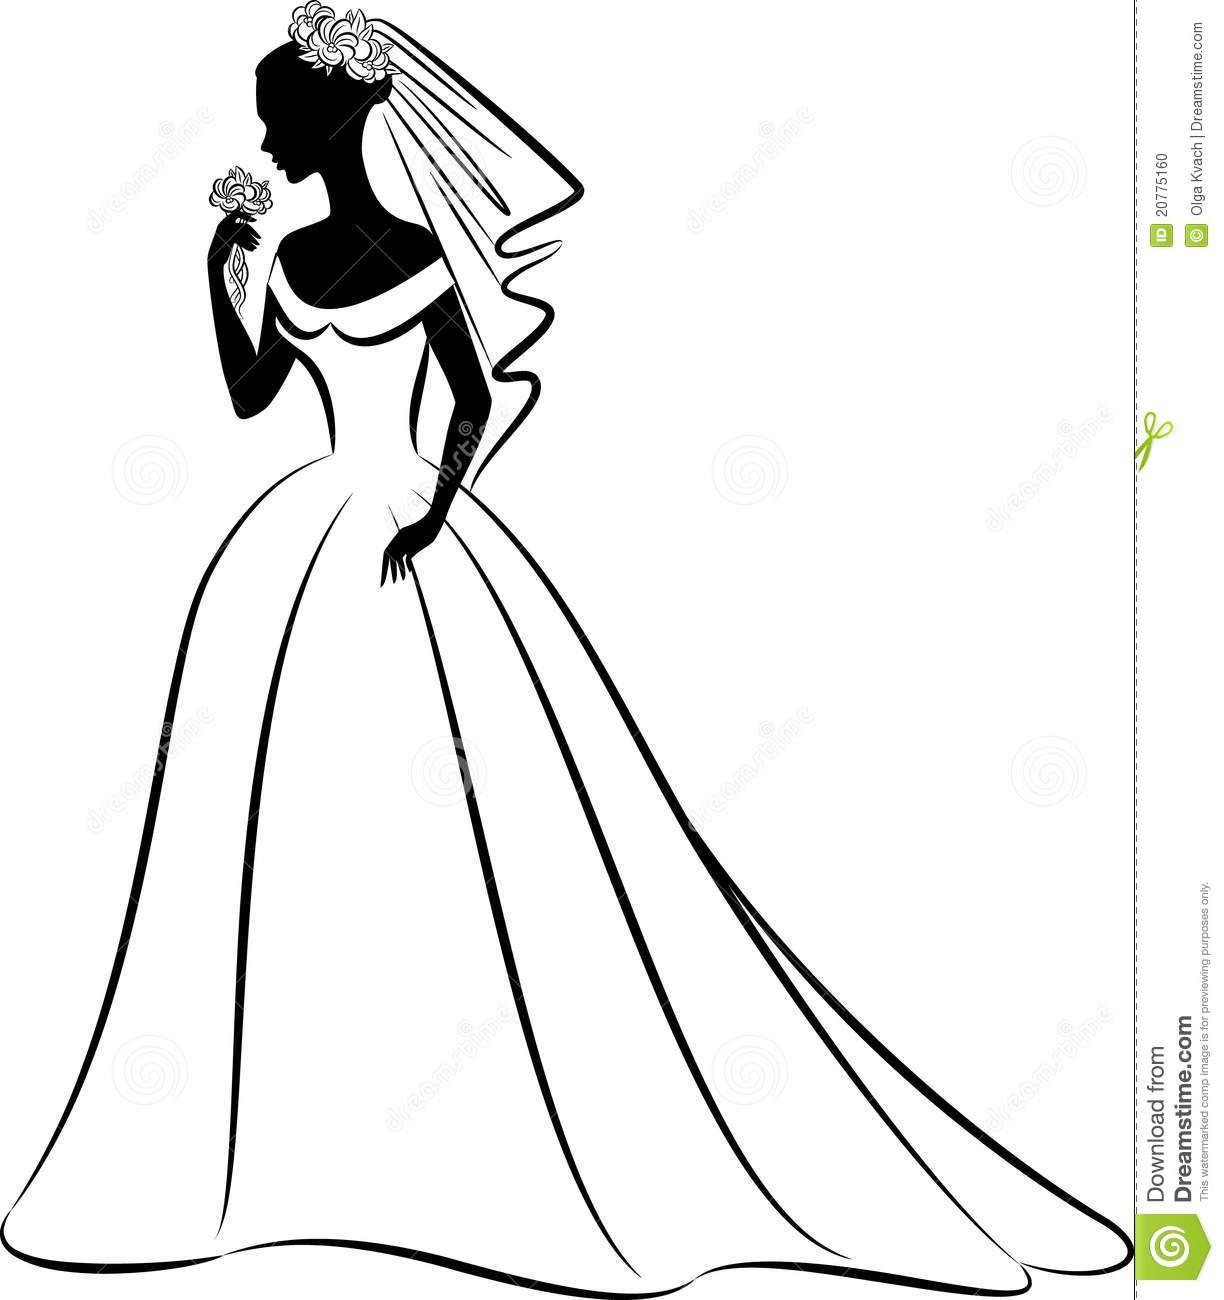 Bride clipart black and white. Bridal clip art yahoo